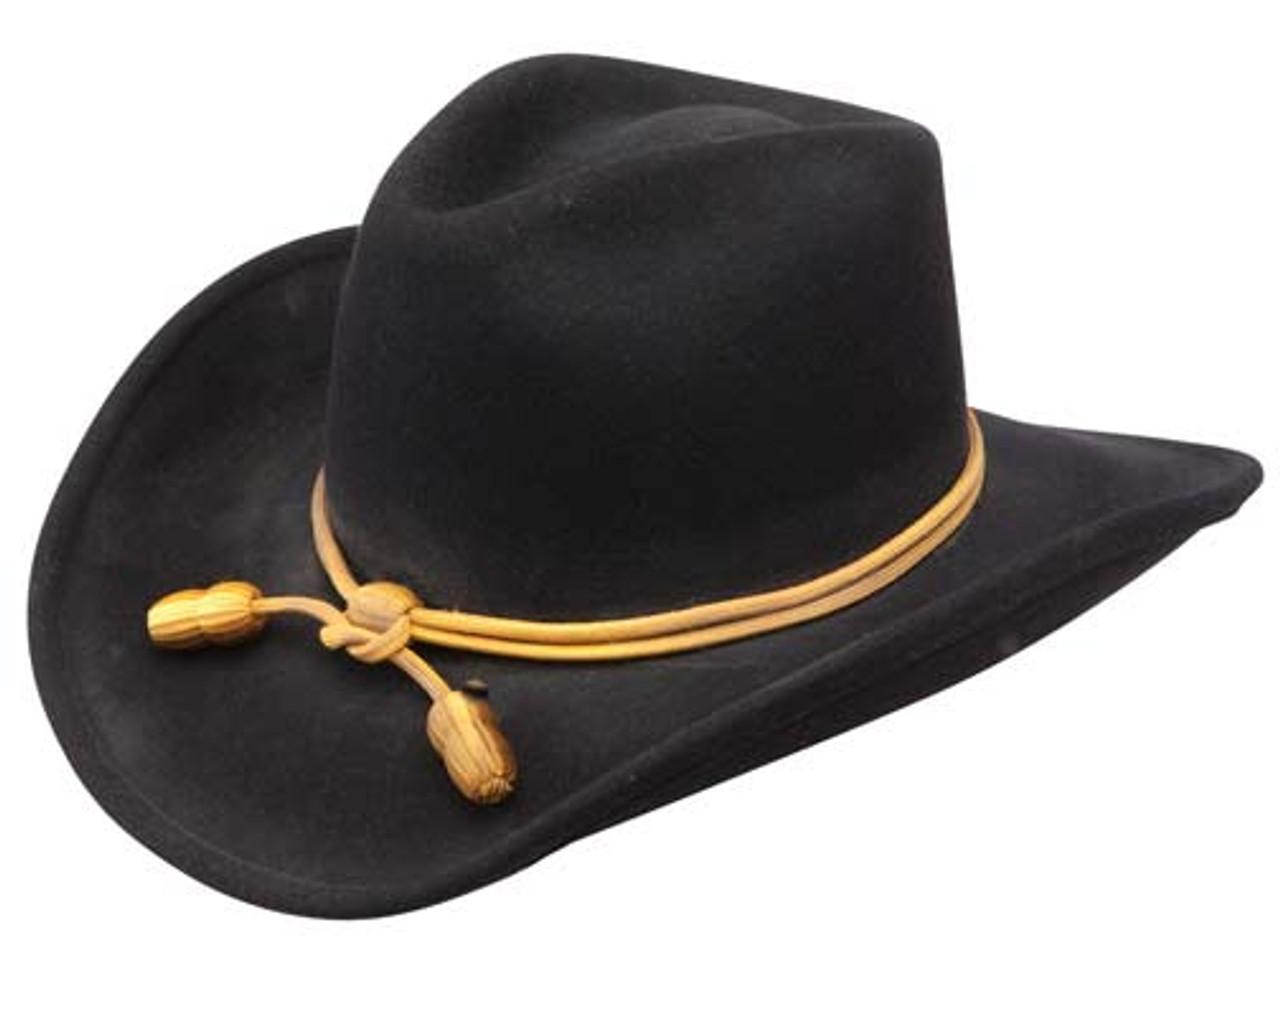 RESISTOL JOHN WAYNE THE FORT CRUSHABLE BLACK CAVALRY COWBOY HAT ... 0d0e18dca67